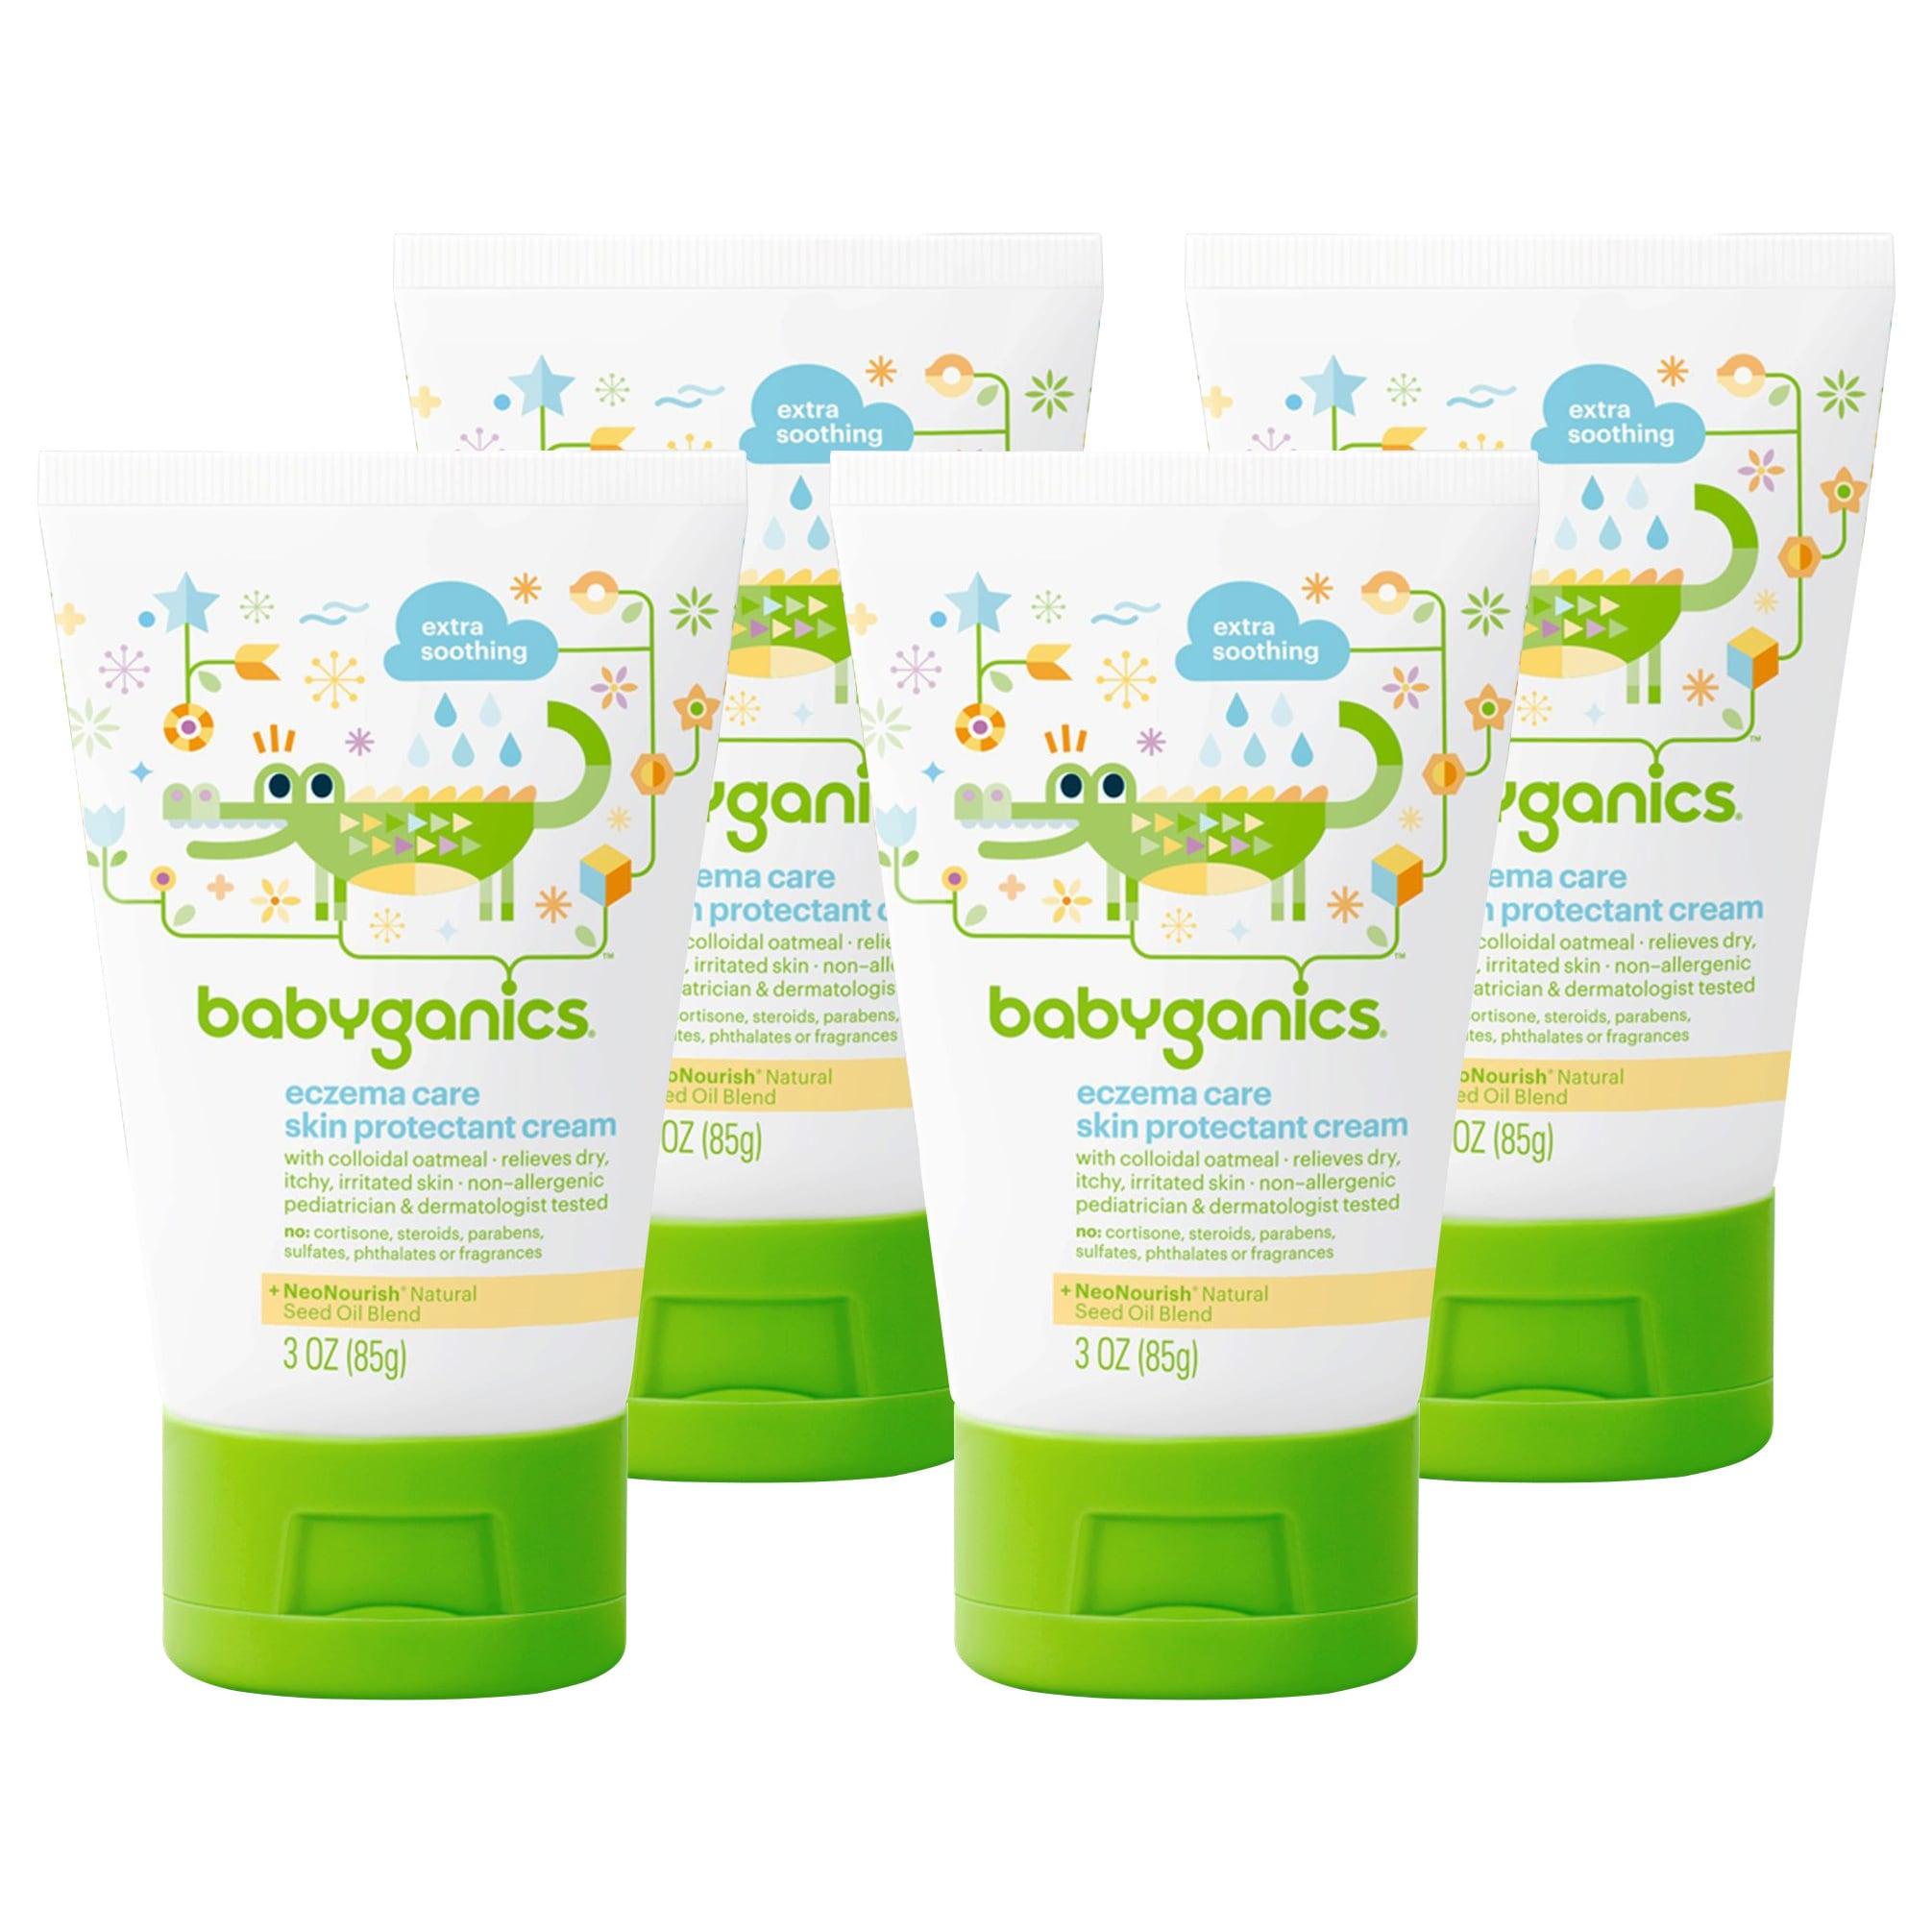 BabyGanics Eczema Care Skin Protectant Cream, 3 Ounce, 4 ...